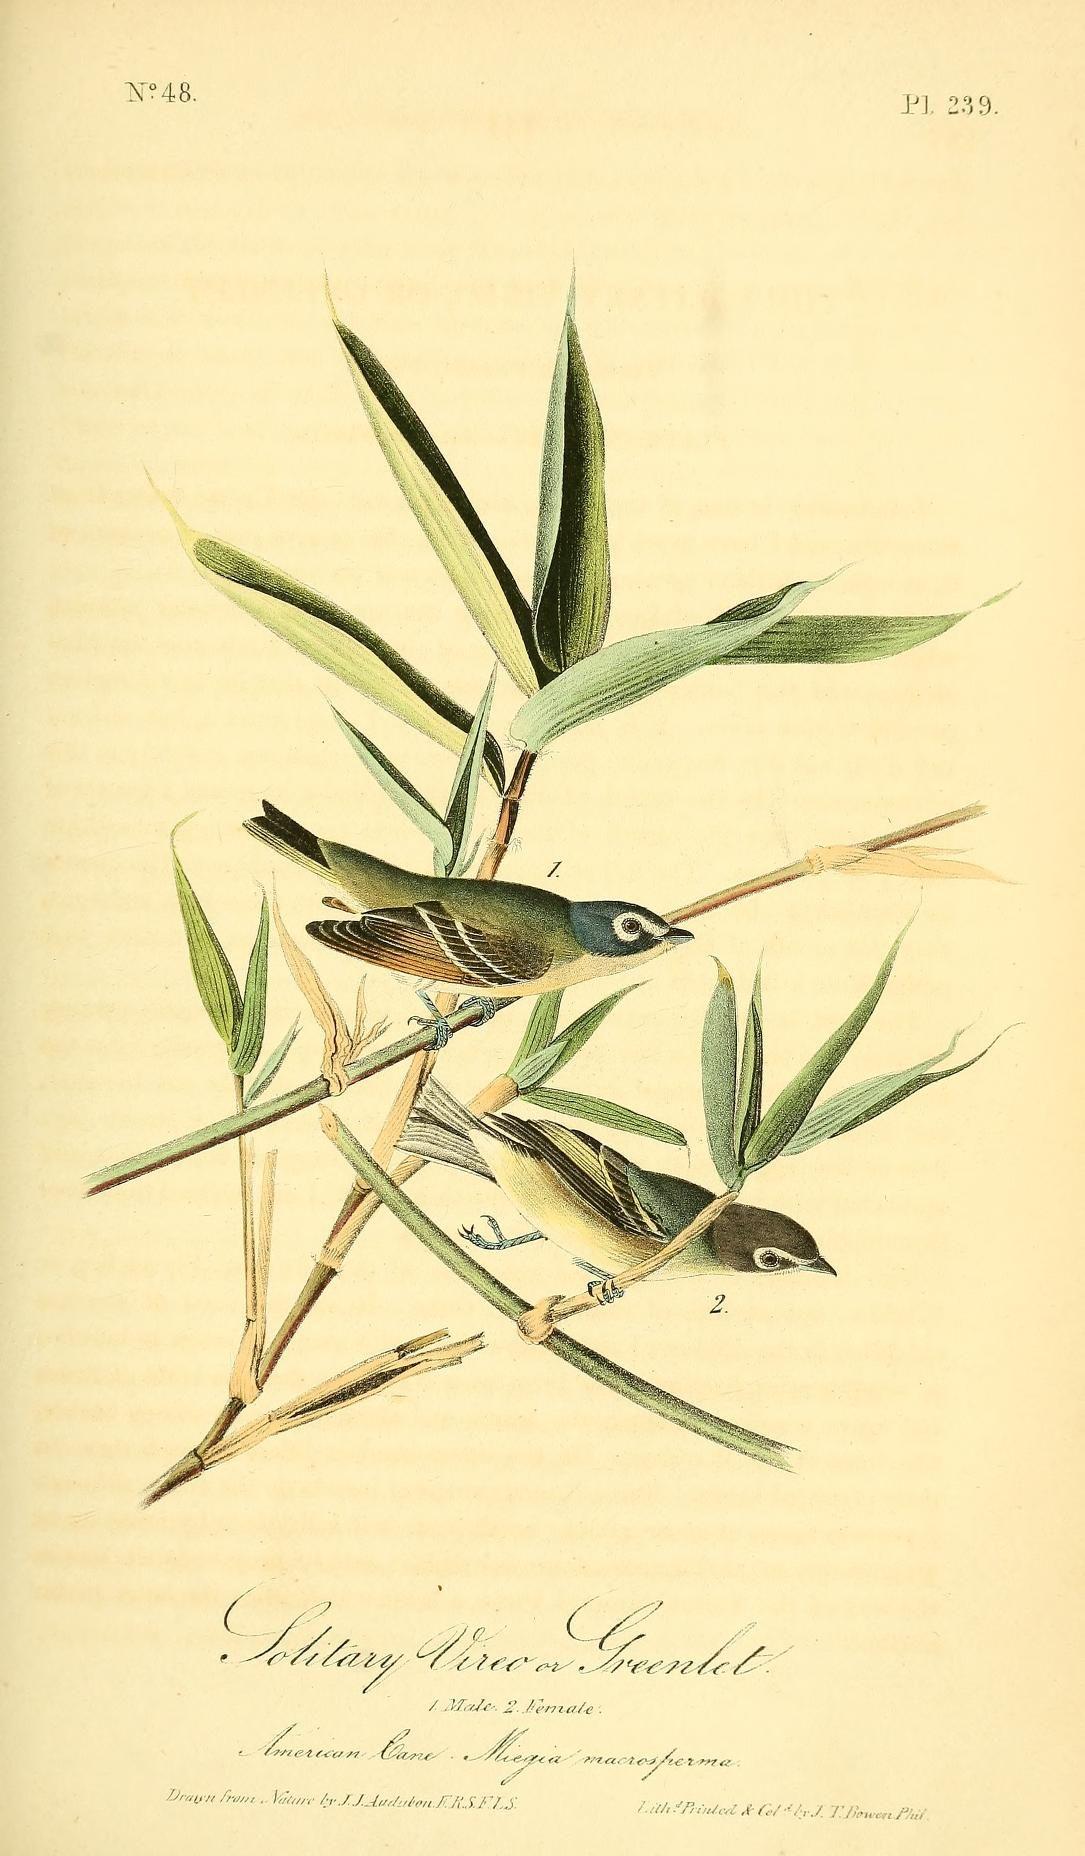 1842, v 4 - The birds of America :John James Audubon - Biodiversity Heritage Library - Solitary Greenlet